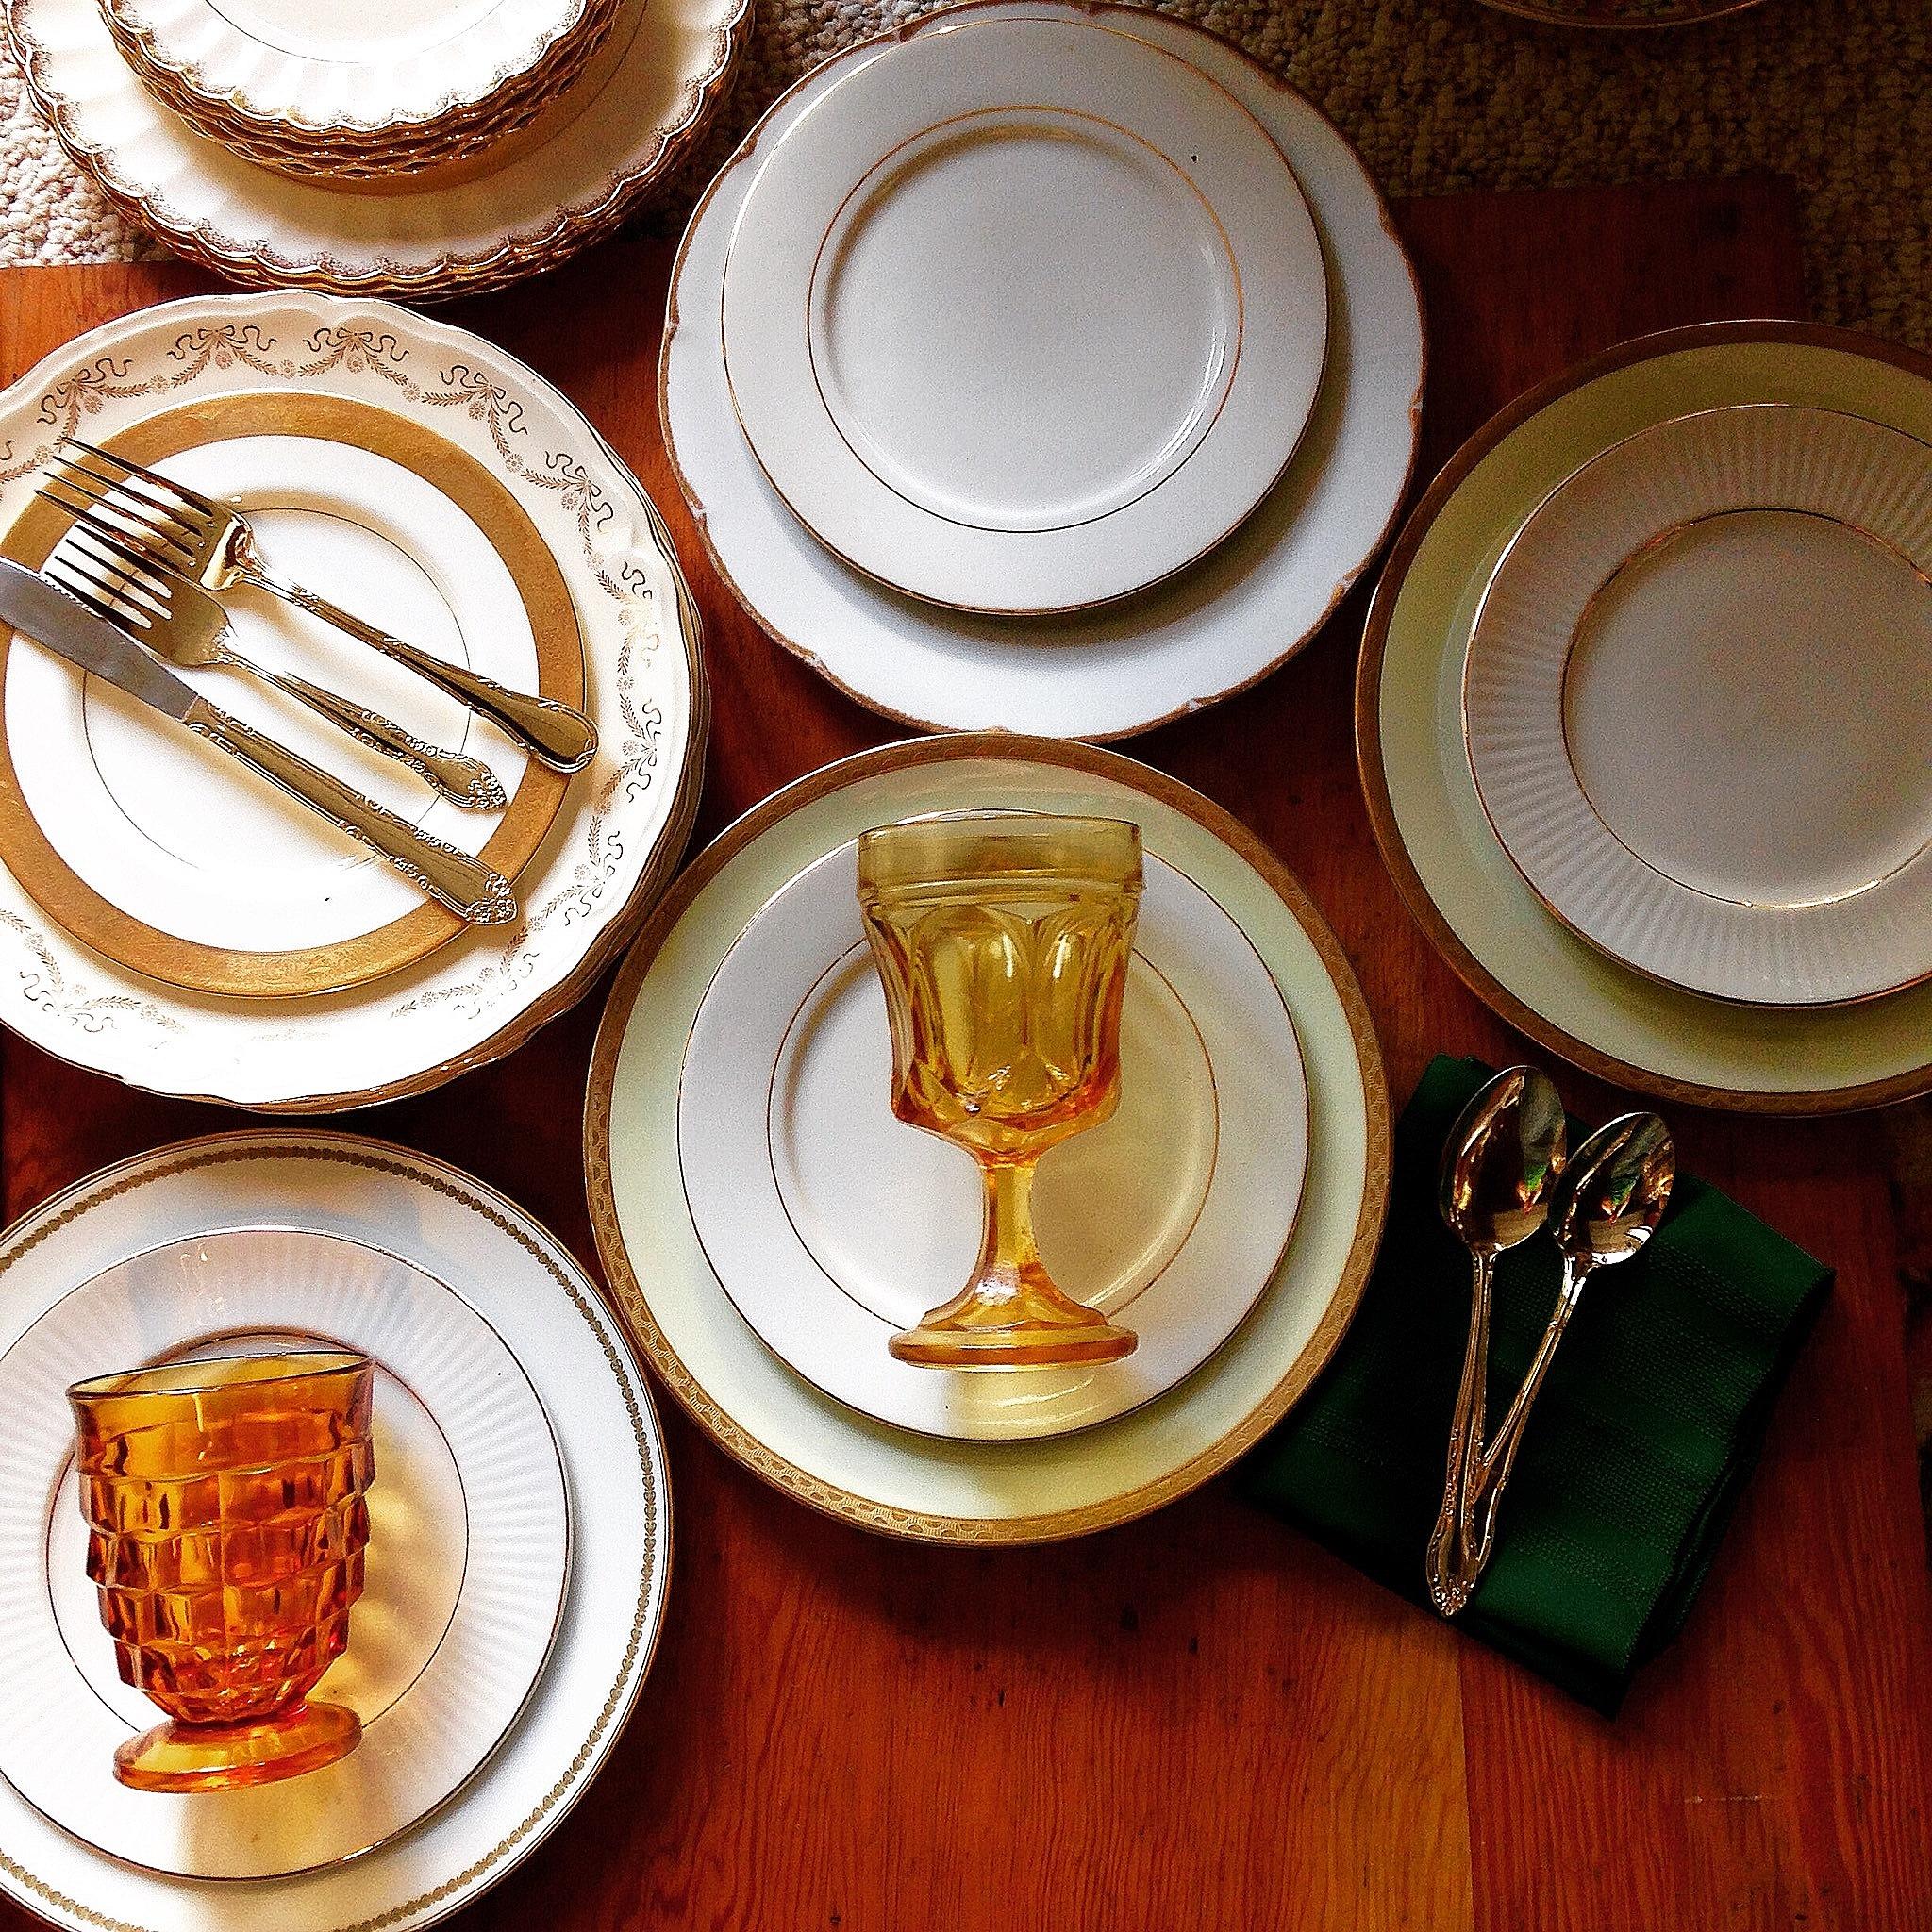 About Sellwood Vintage Rental. flatwarebizcards. 01814802f1a32c2f23fcbfbbf4d2809397acf4f232 & Sellwood Vintage Rental | Wedding u0026 Party Rentals u2013 Classic Fine ...